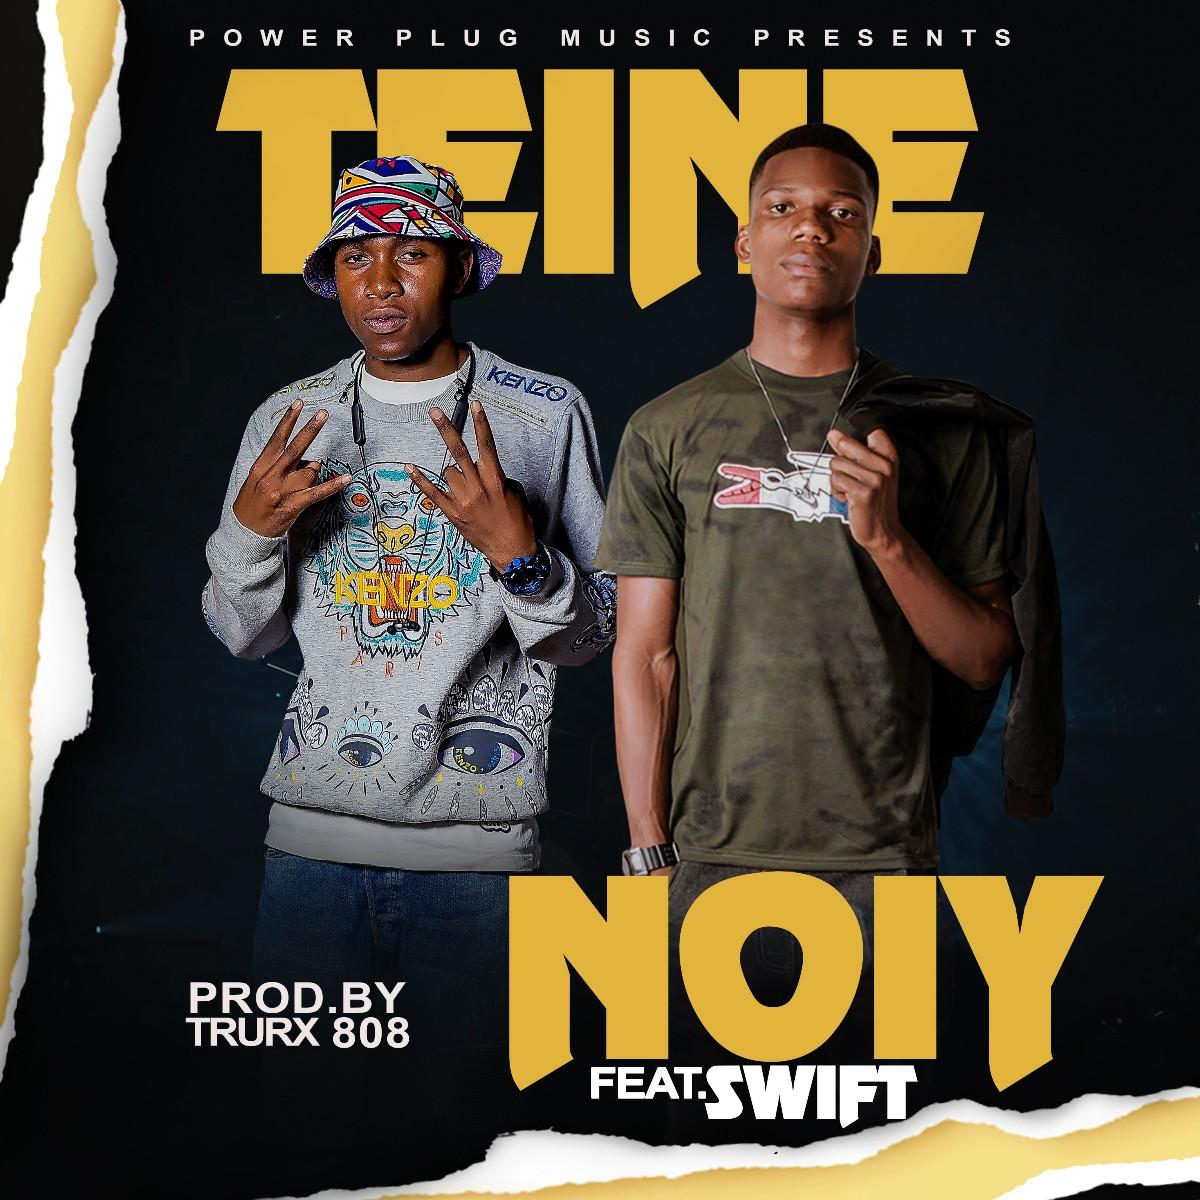 Noiy ft. Swift - Teine (Prod. Trurx 808)